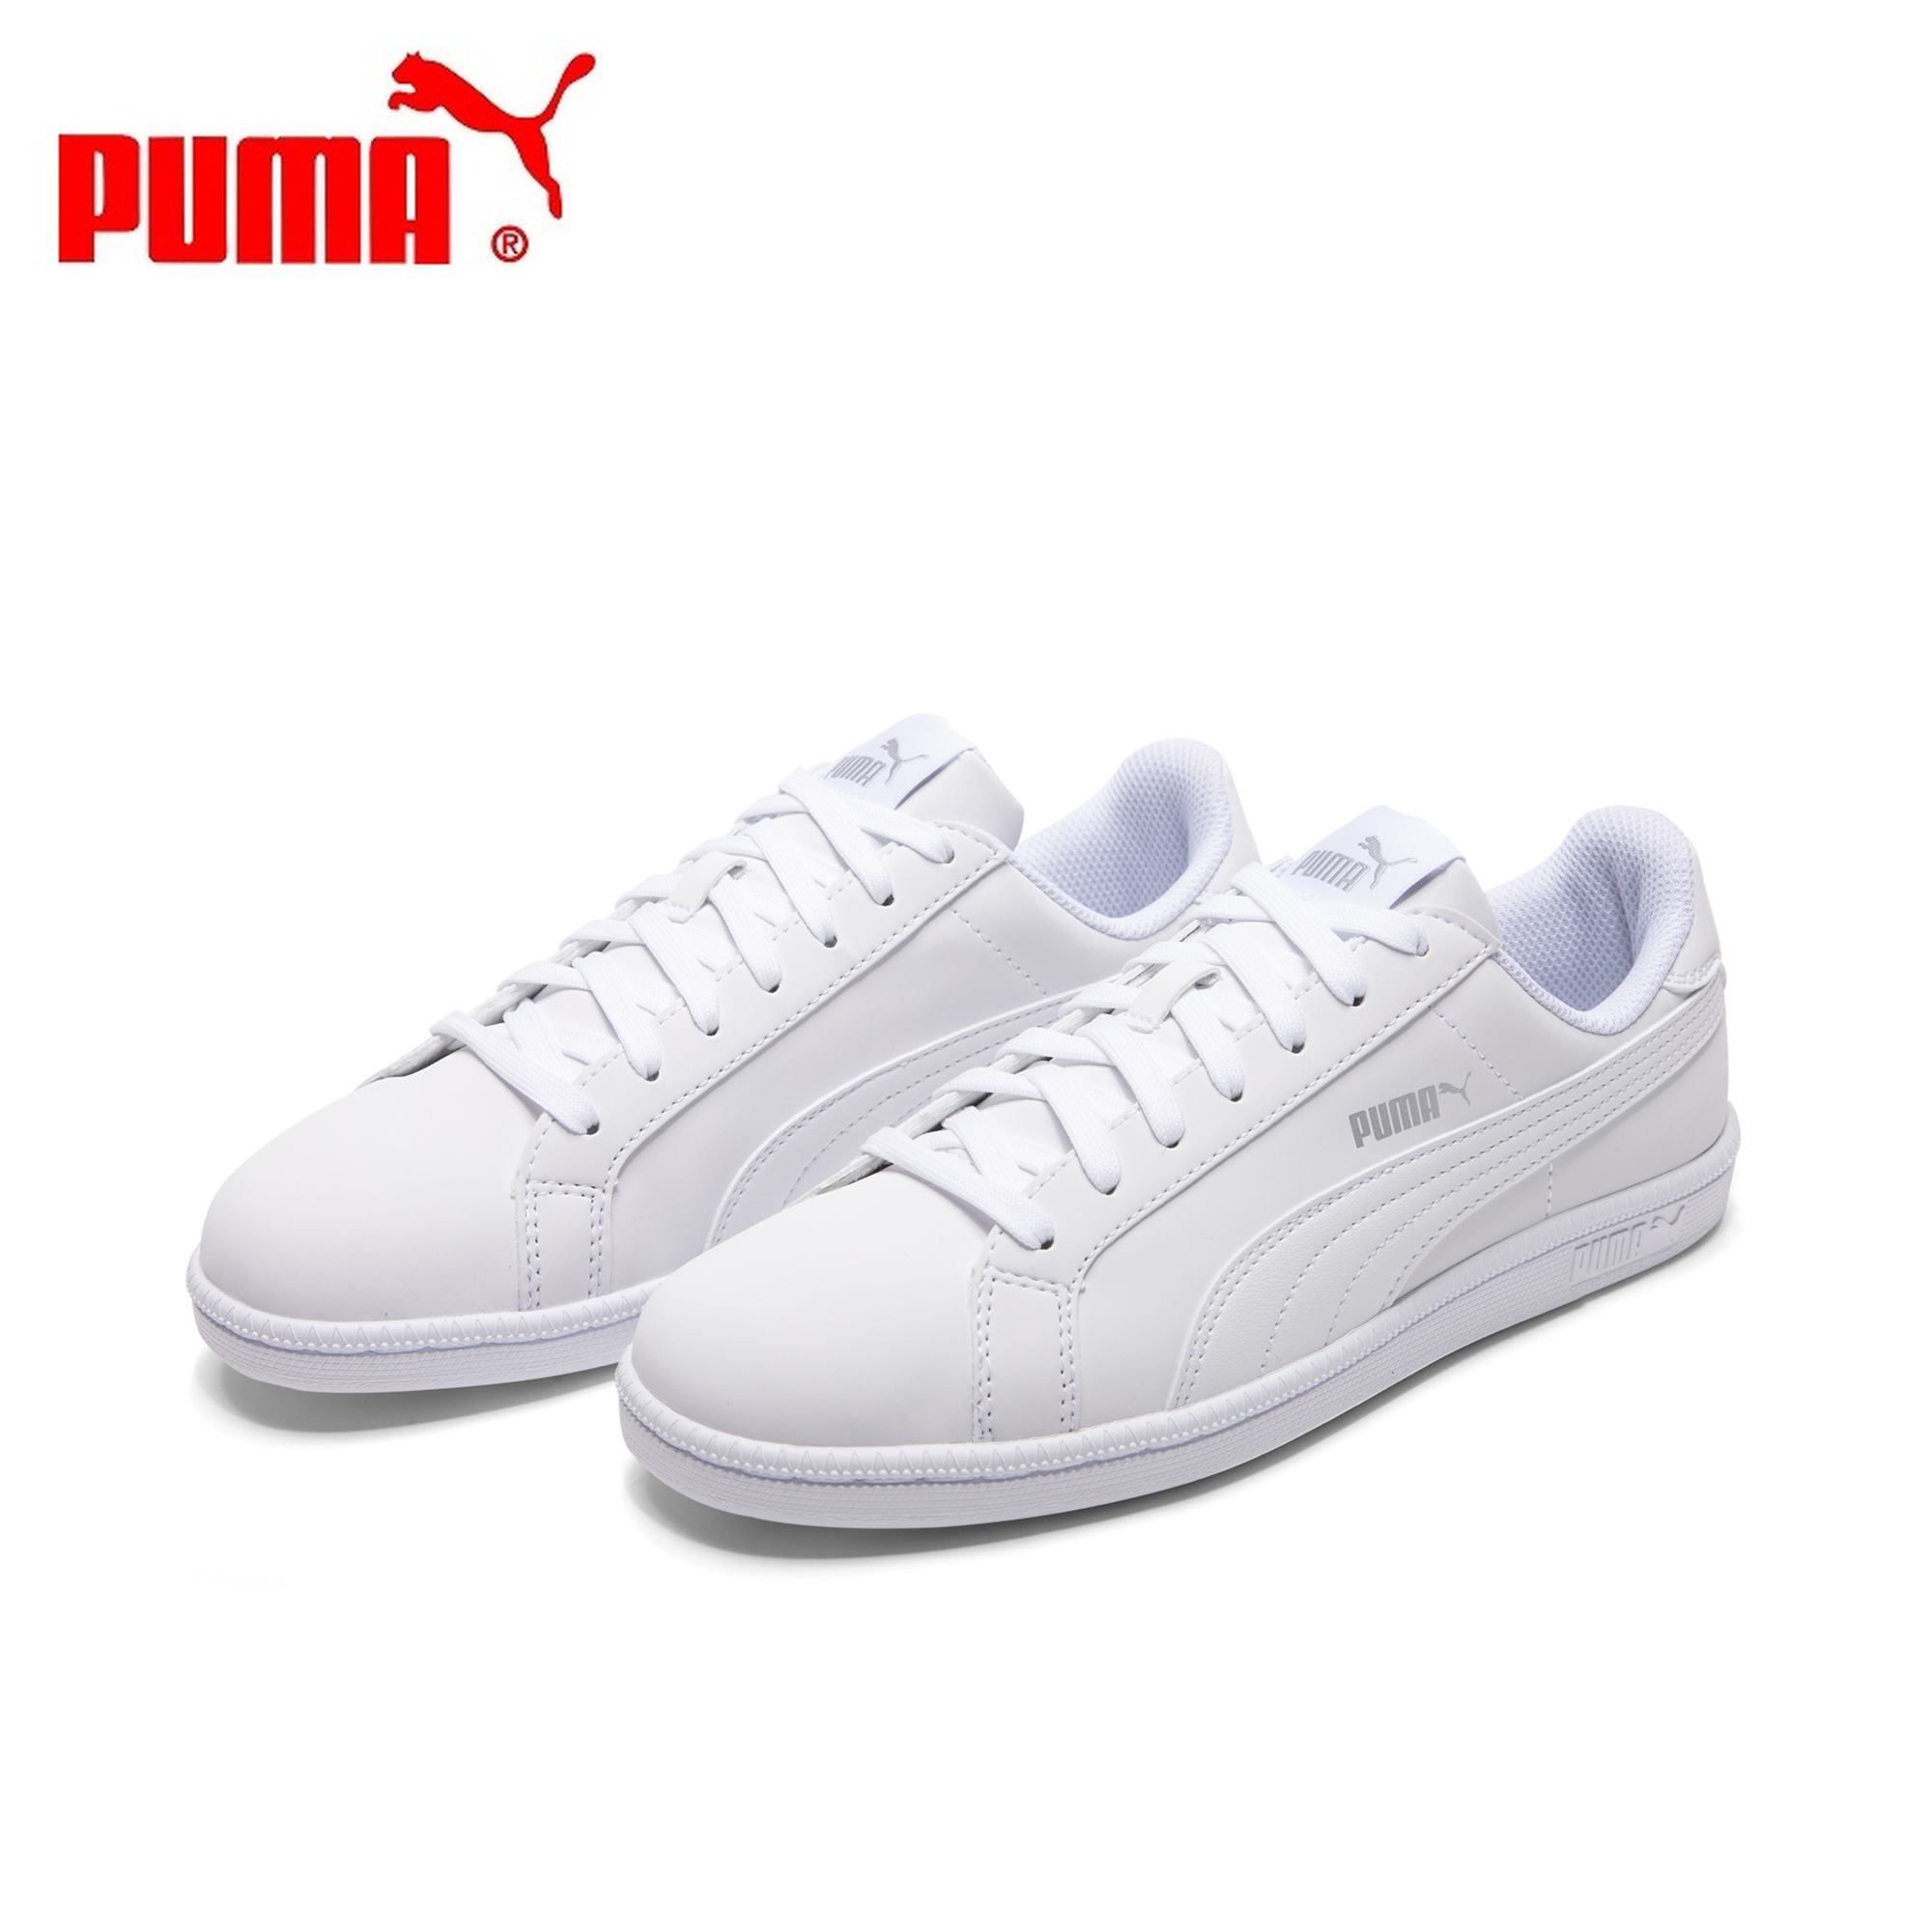 Original Authentic PUMA Men Sport Sneakers Smash Buck Women Skateboarding Shoes White Classics Style Low Flat 2019 New 35675324